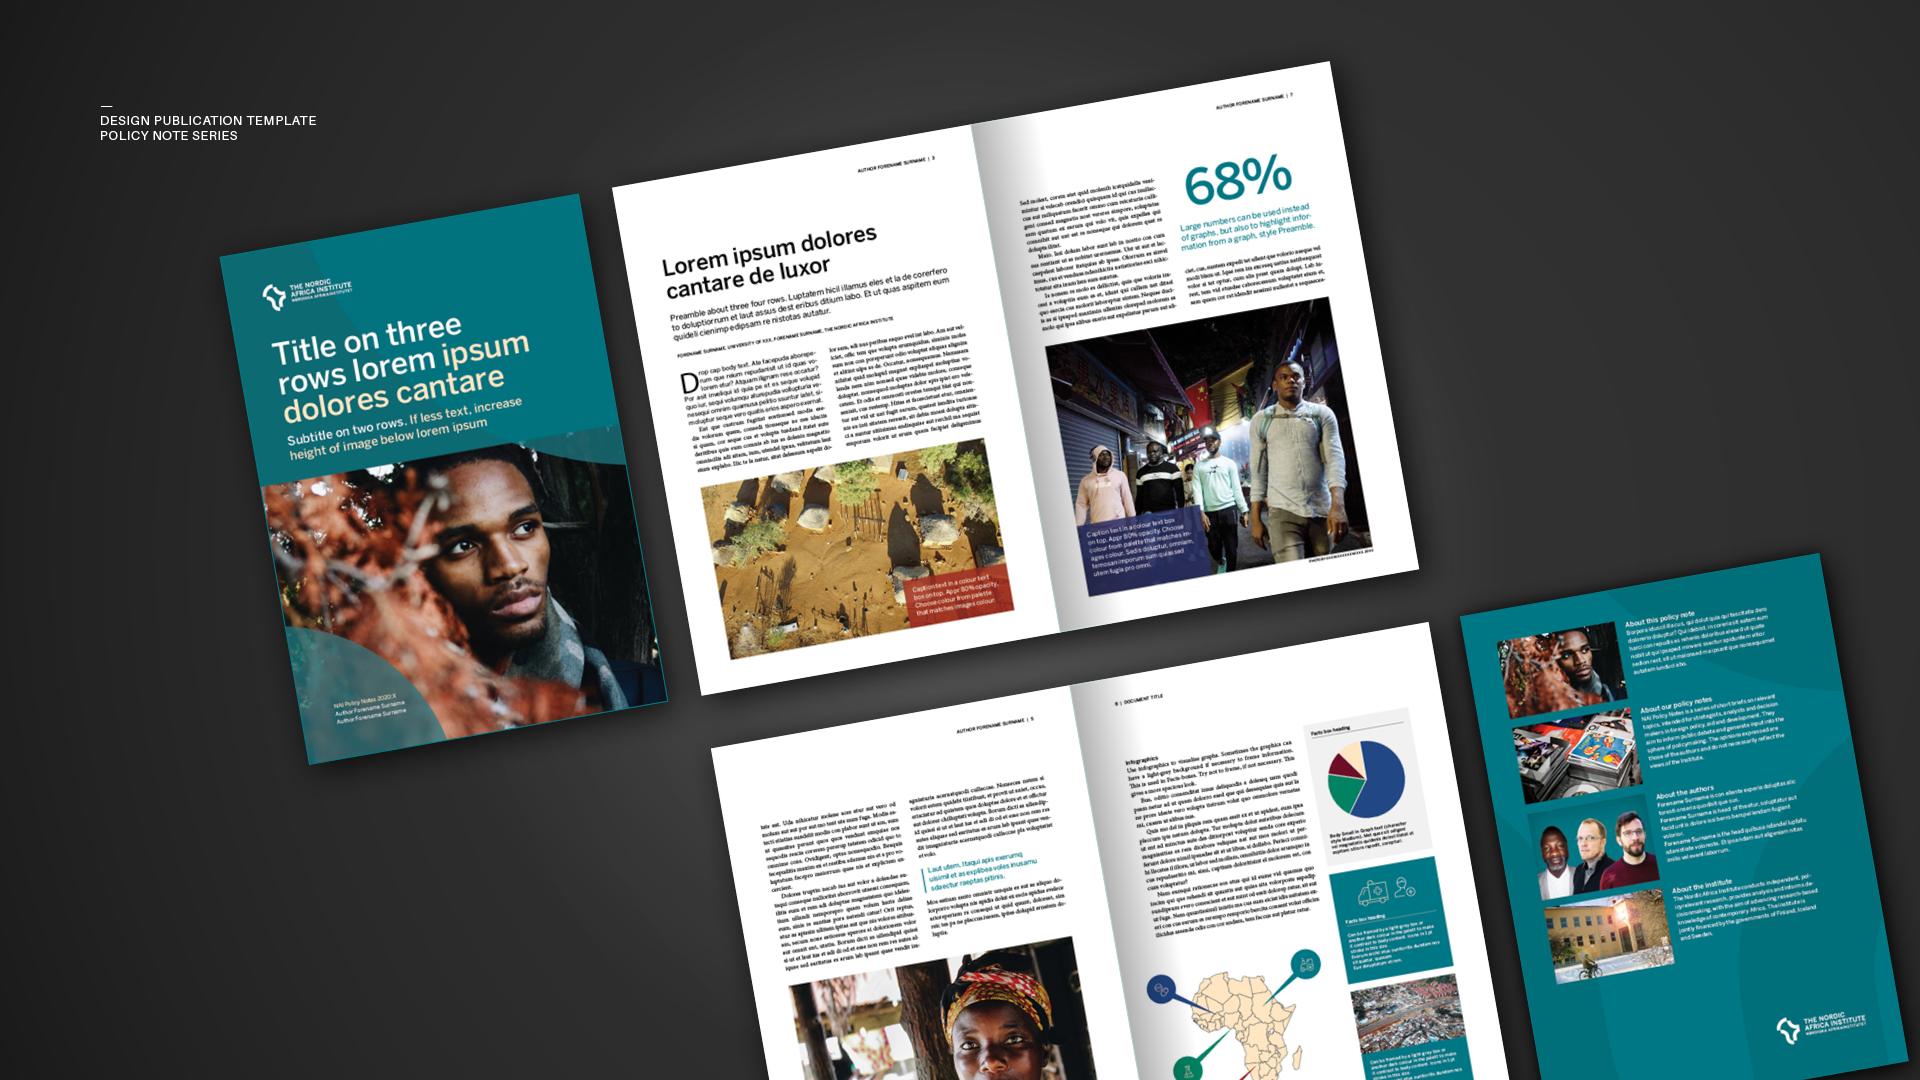 design-publication-3-nai